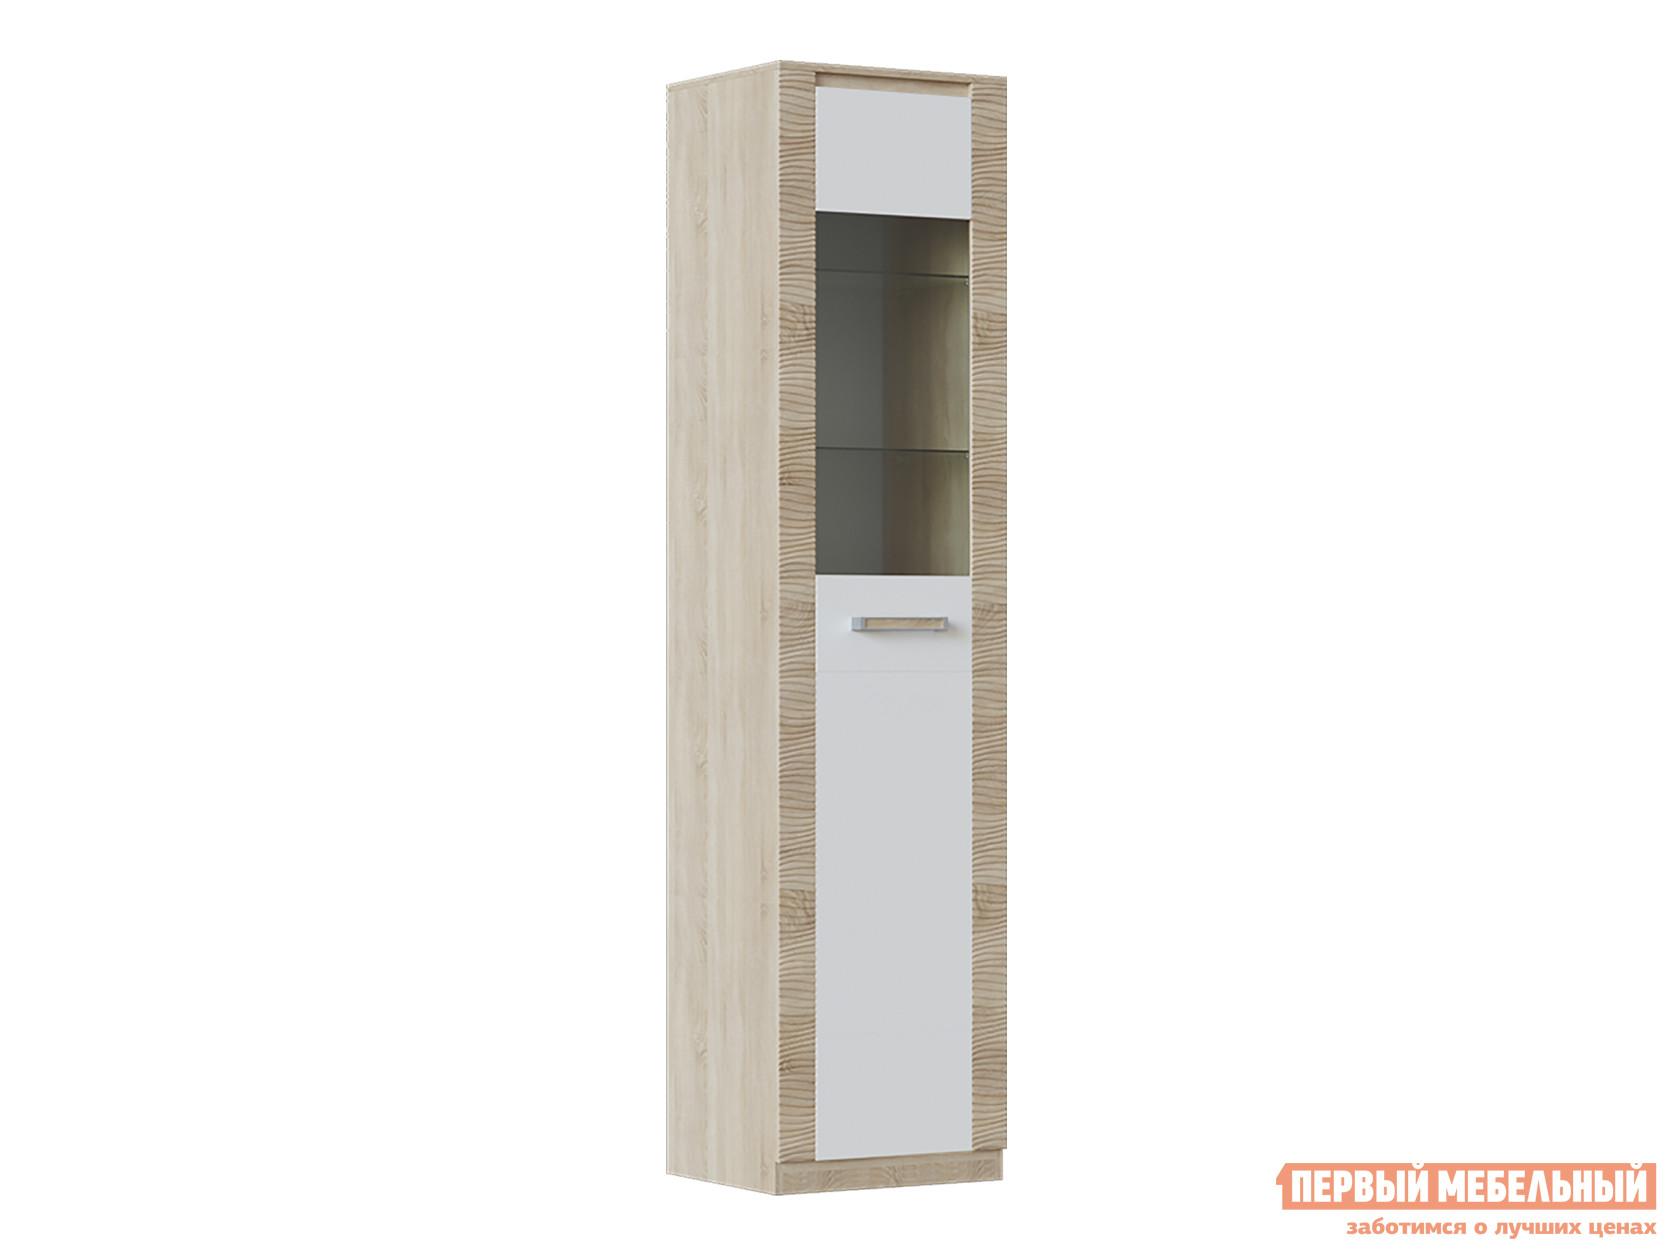 Шкаф-витрина  Элегия ШК-149 Дуб Сонома / Белый глянец